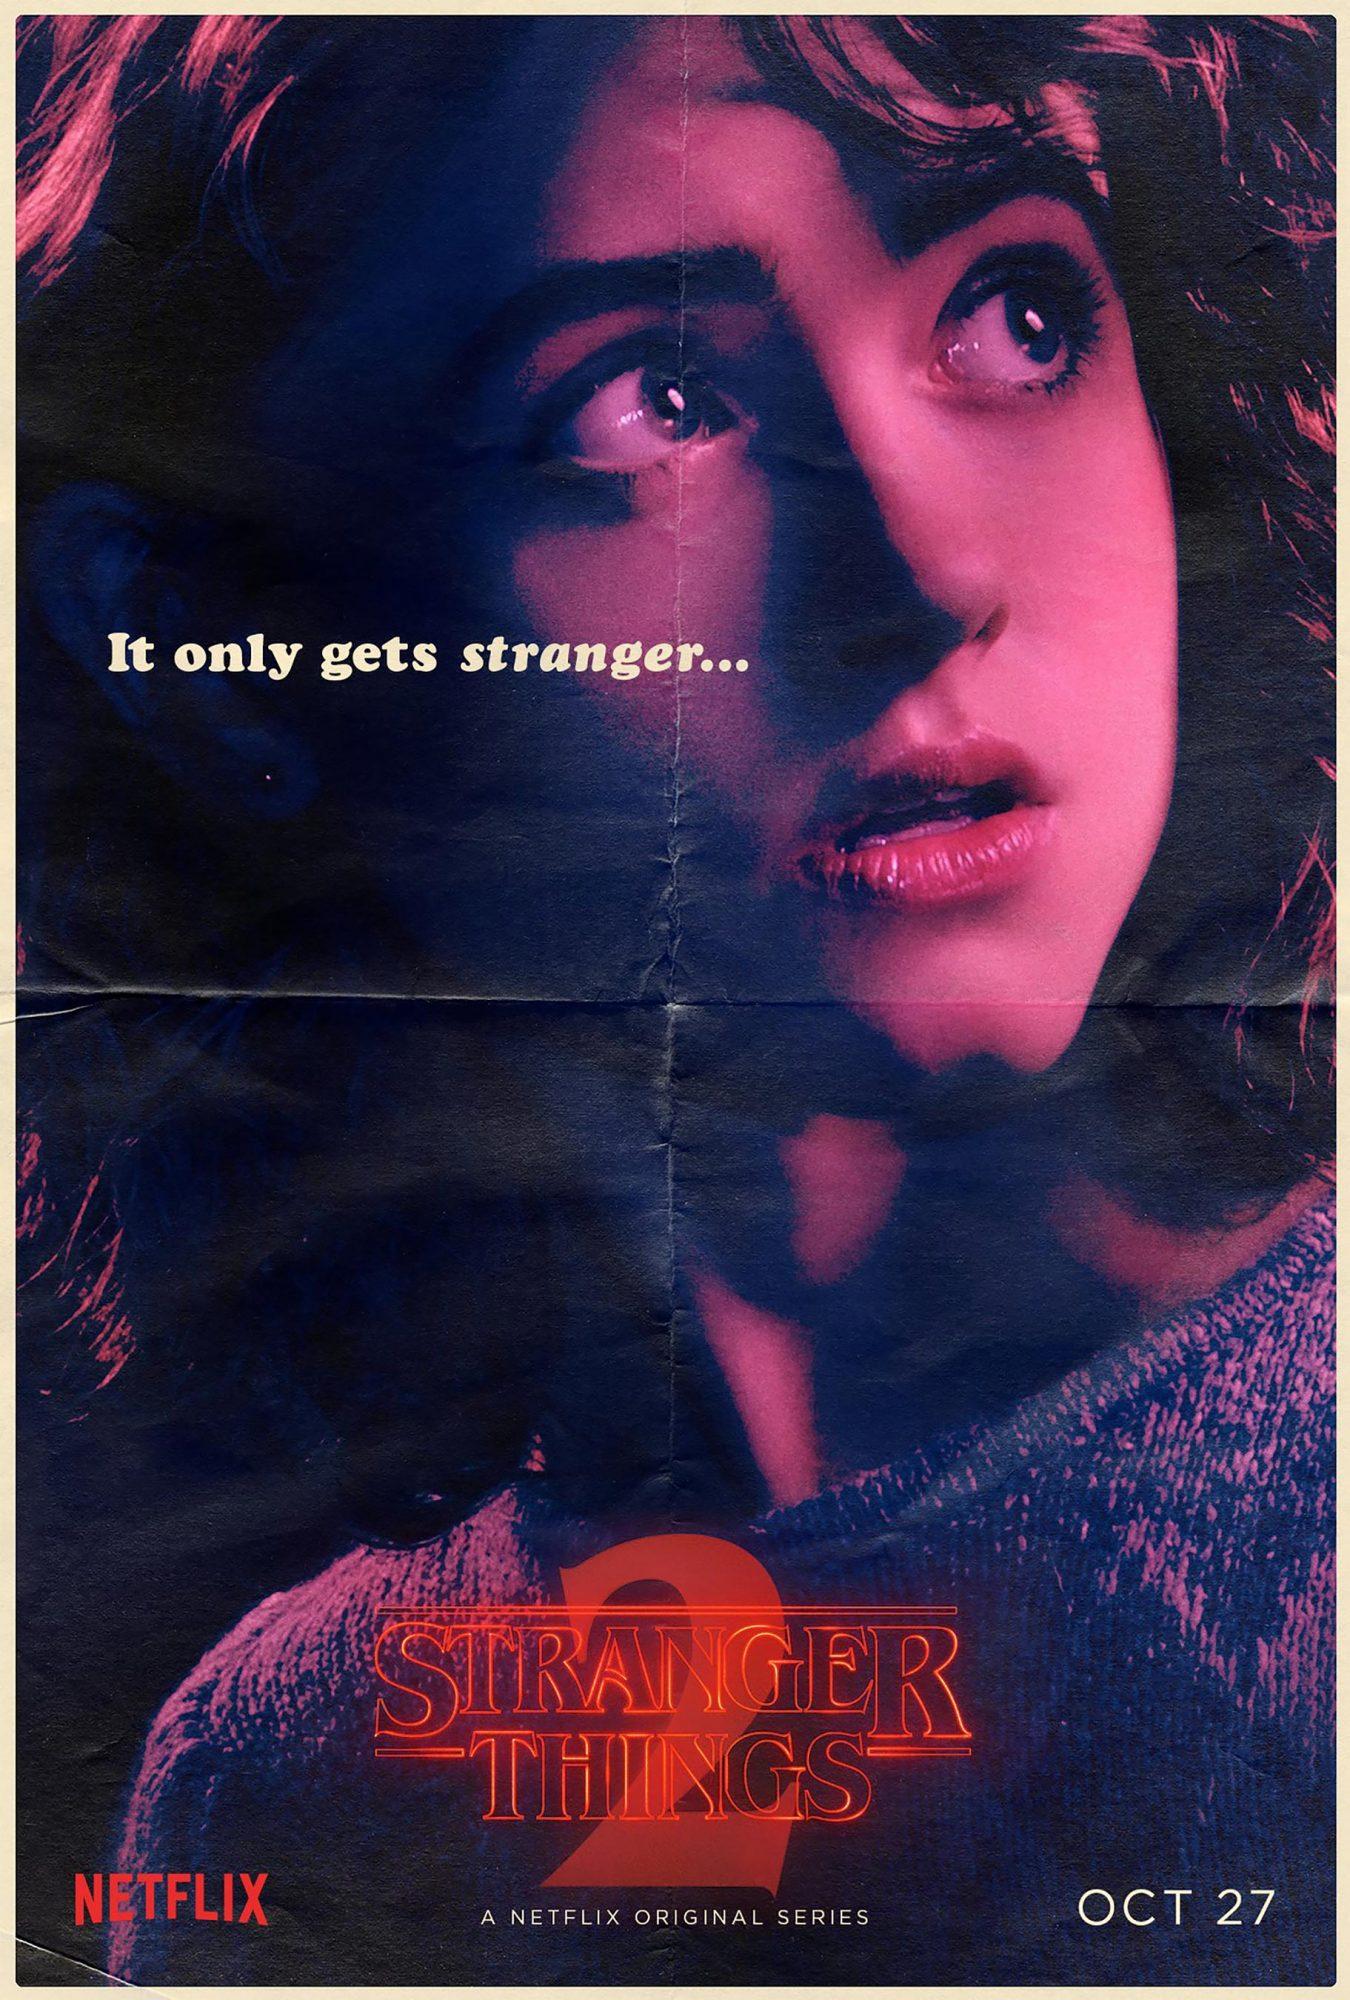 Stranger Things Season 2 - Natalia Dyer CR: Netflix